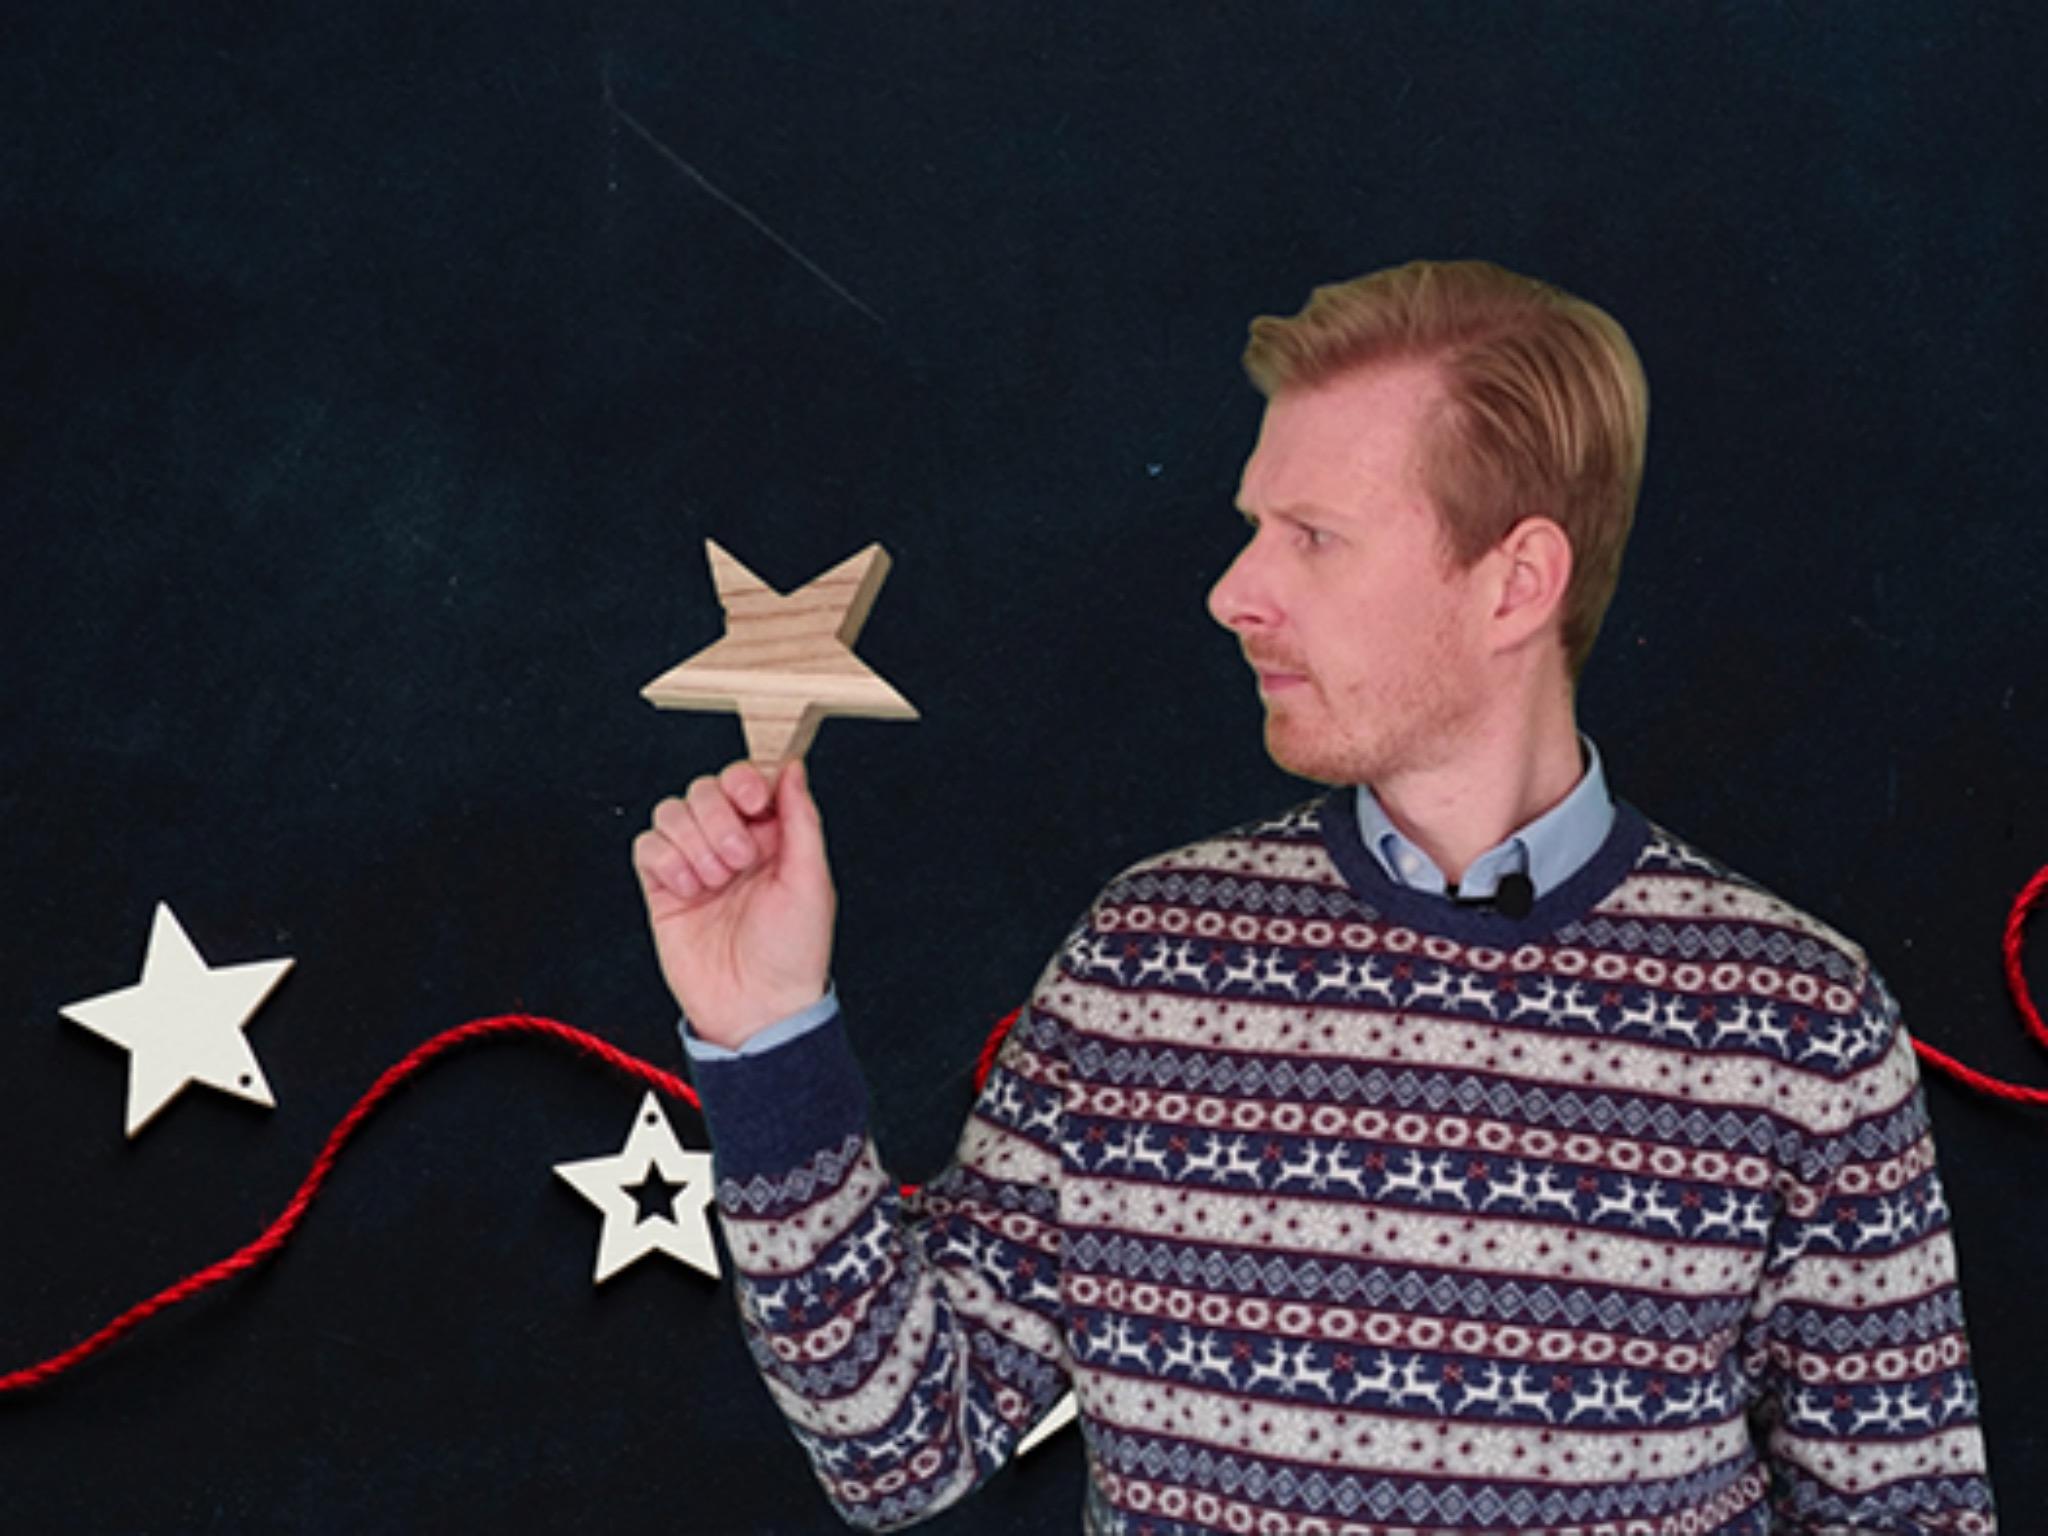 Der Würzburger Historiker Benjamin Hasselhorn hinterfragt die Weihnachtsgeschichte. Foto: Screenshot Benjamin Hasselhorn